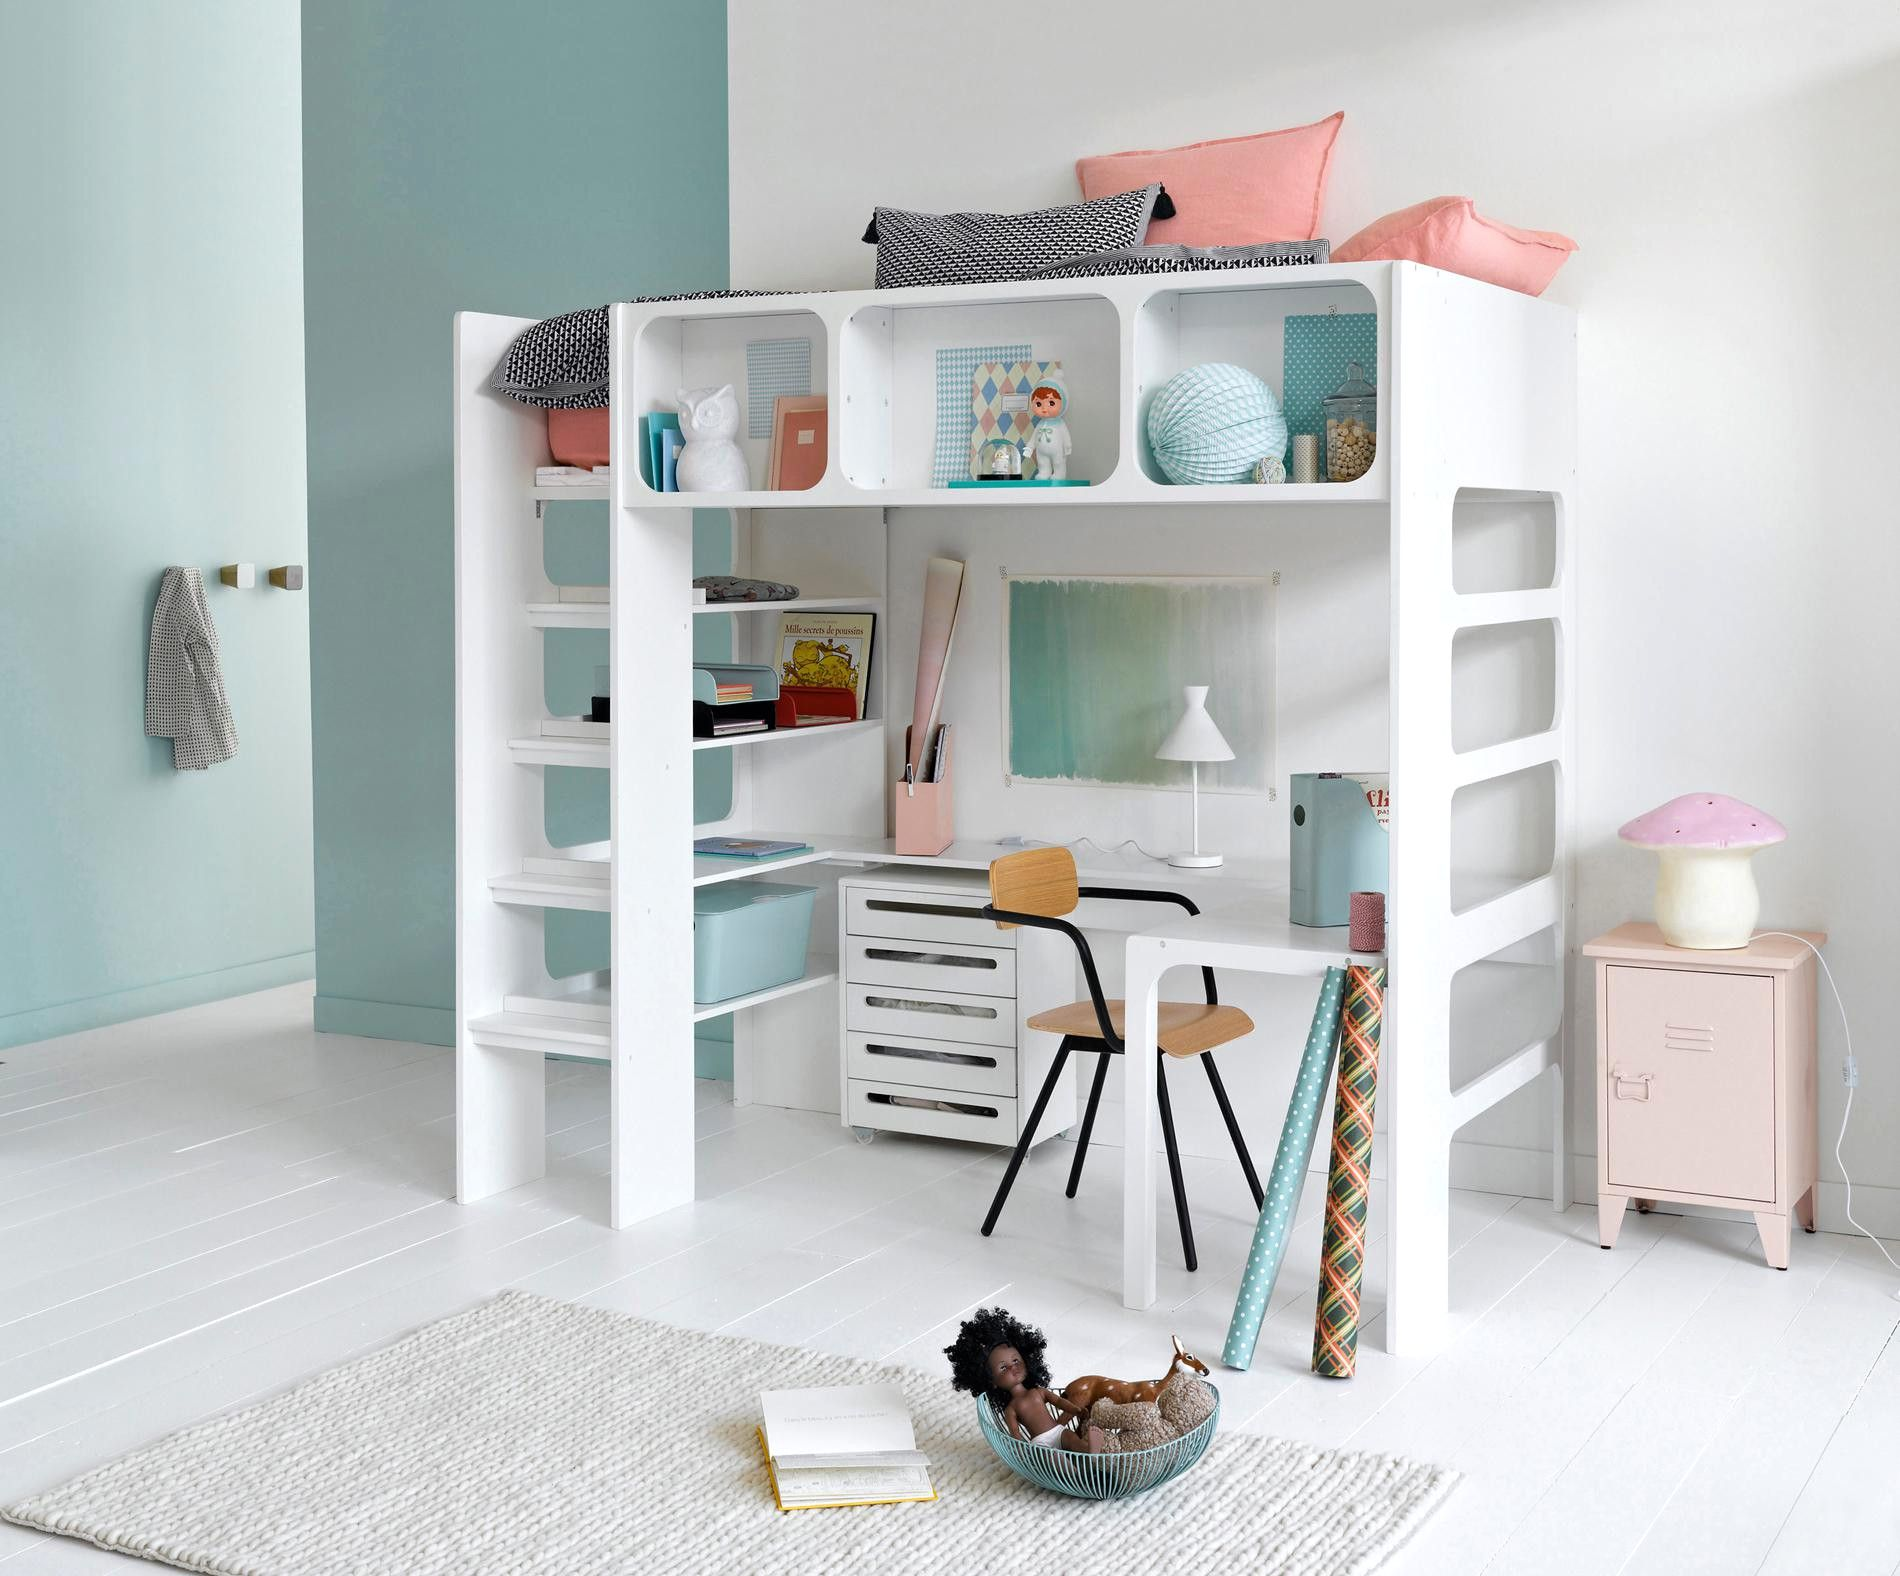 Emejing Idee Rangement Chambre Fille Photos Amazing Lit Mezzanine Deco Chambre Petit Garcon Chambre Lit